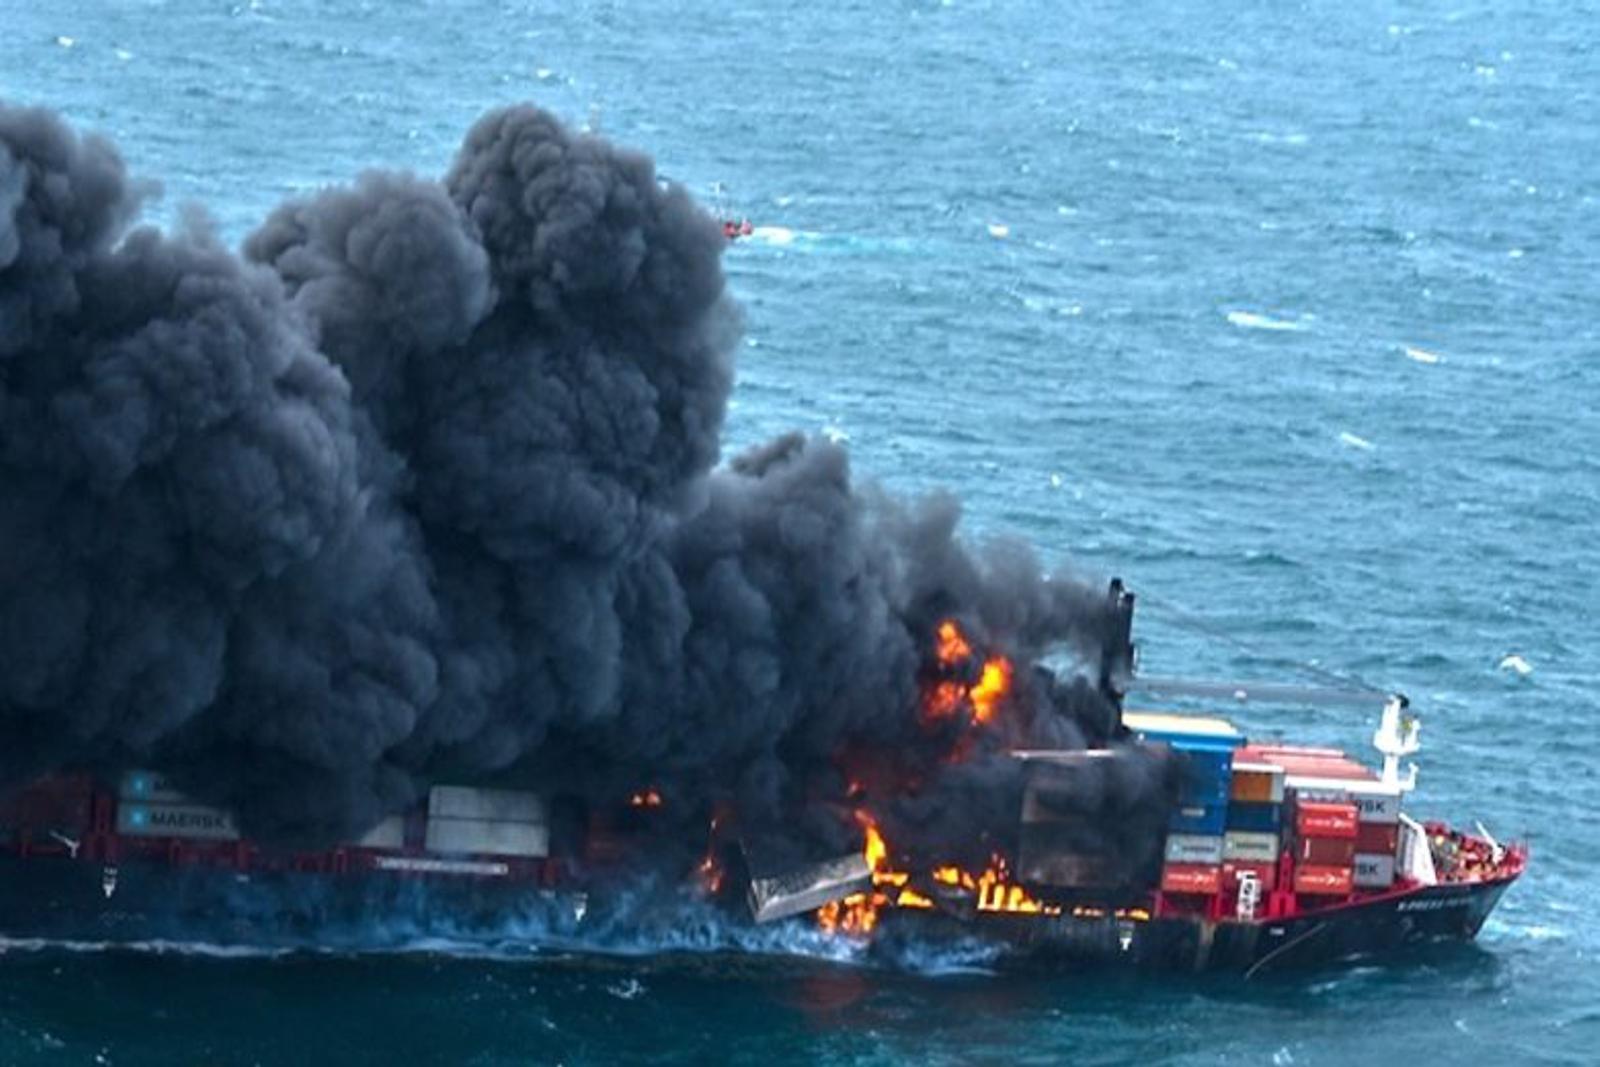 Explosion rocks X-Press Pearl, all crew evacuated as Sri Lanka prepares for the worst